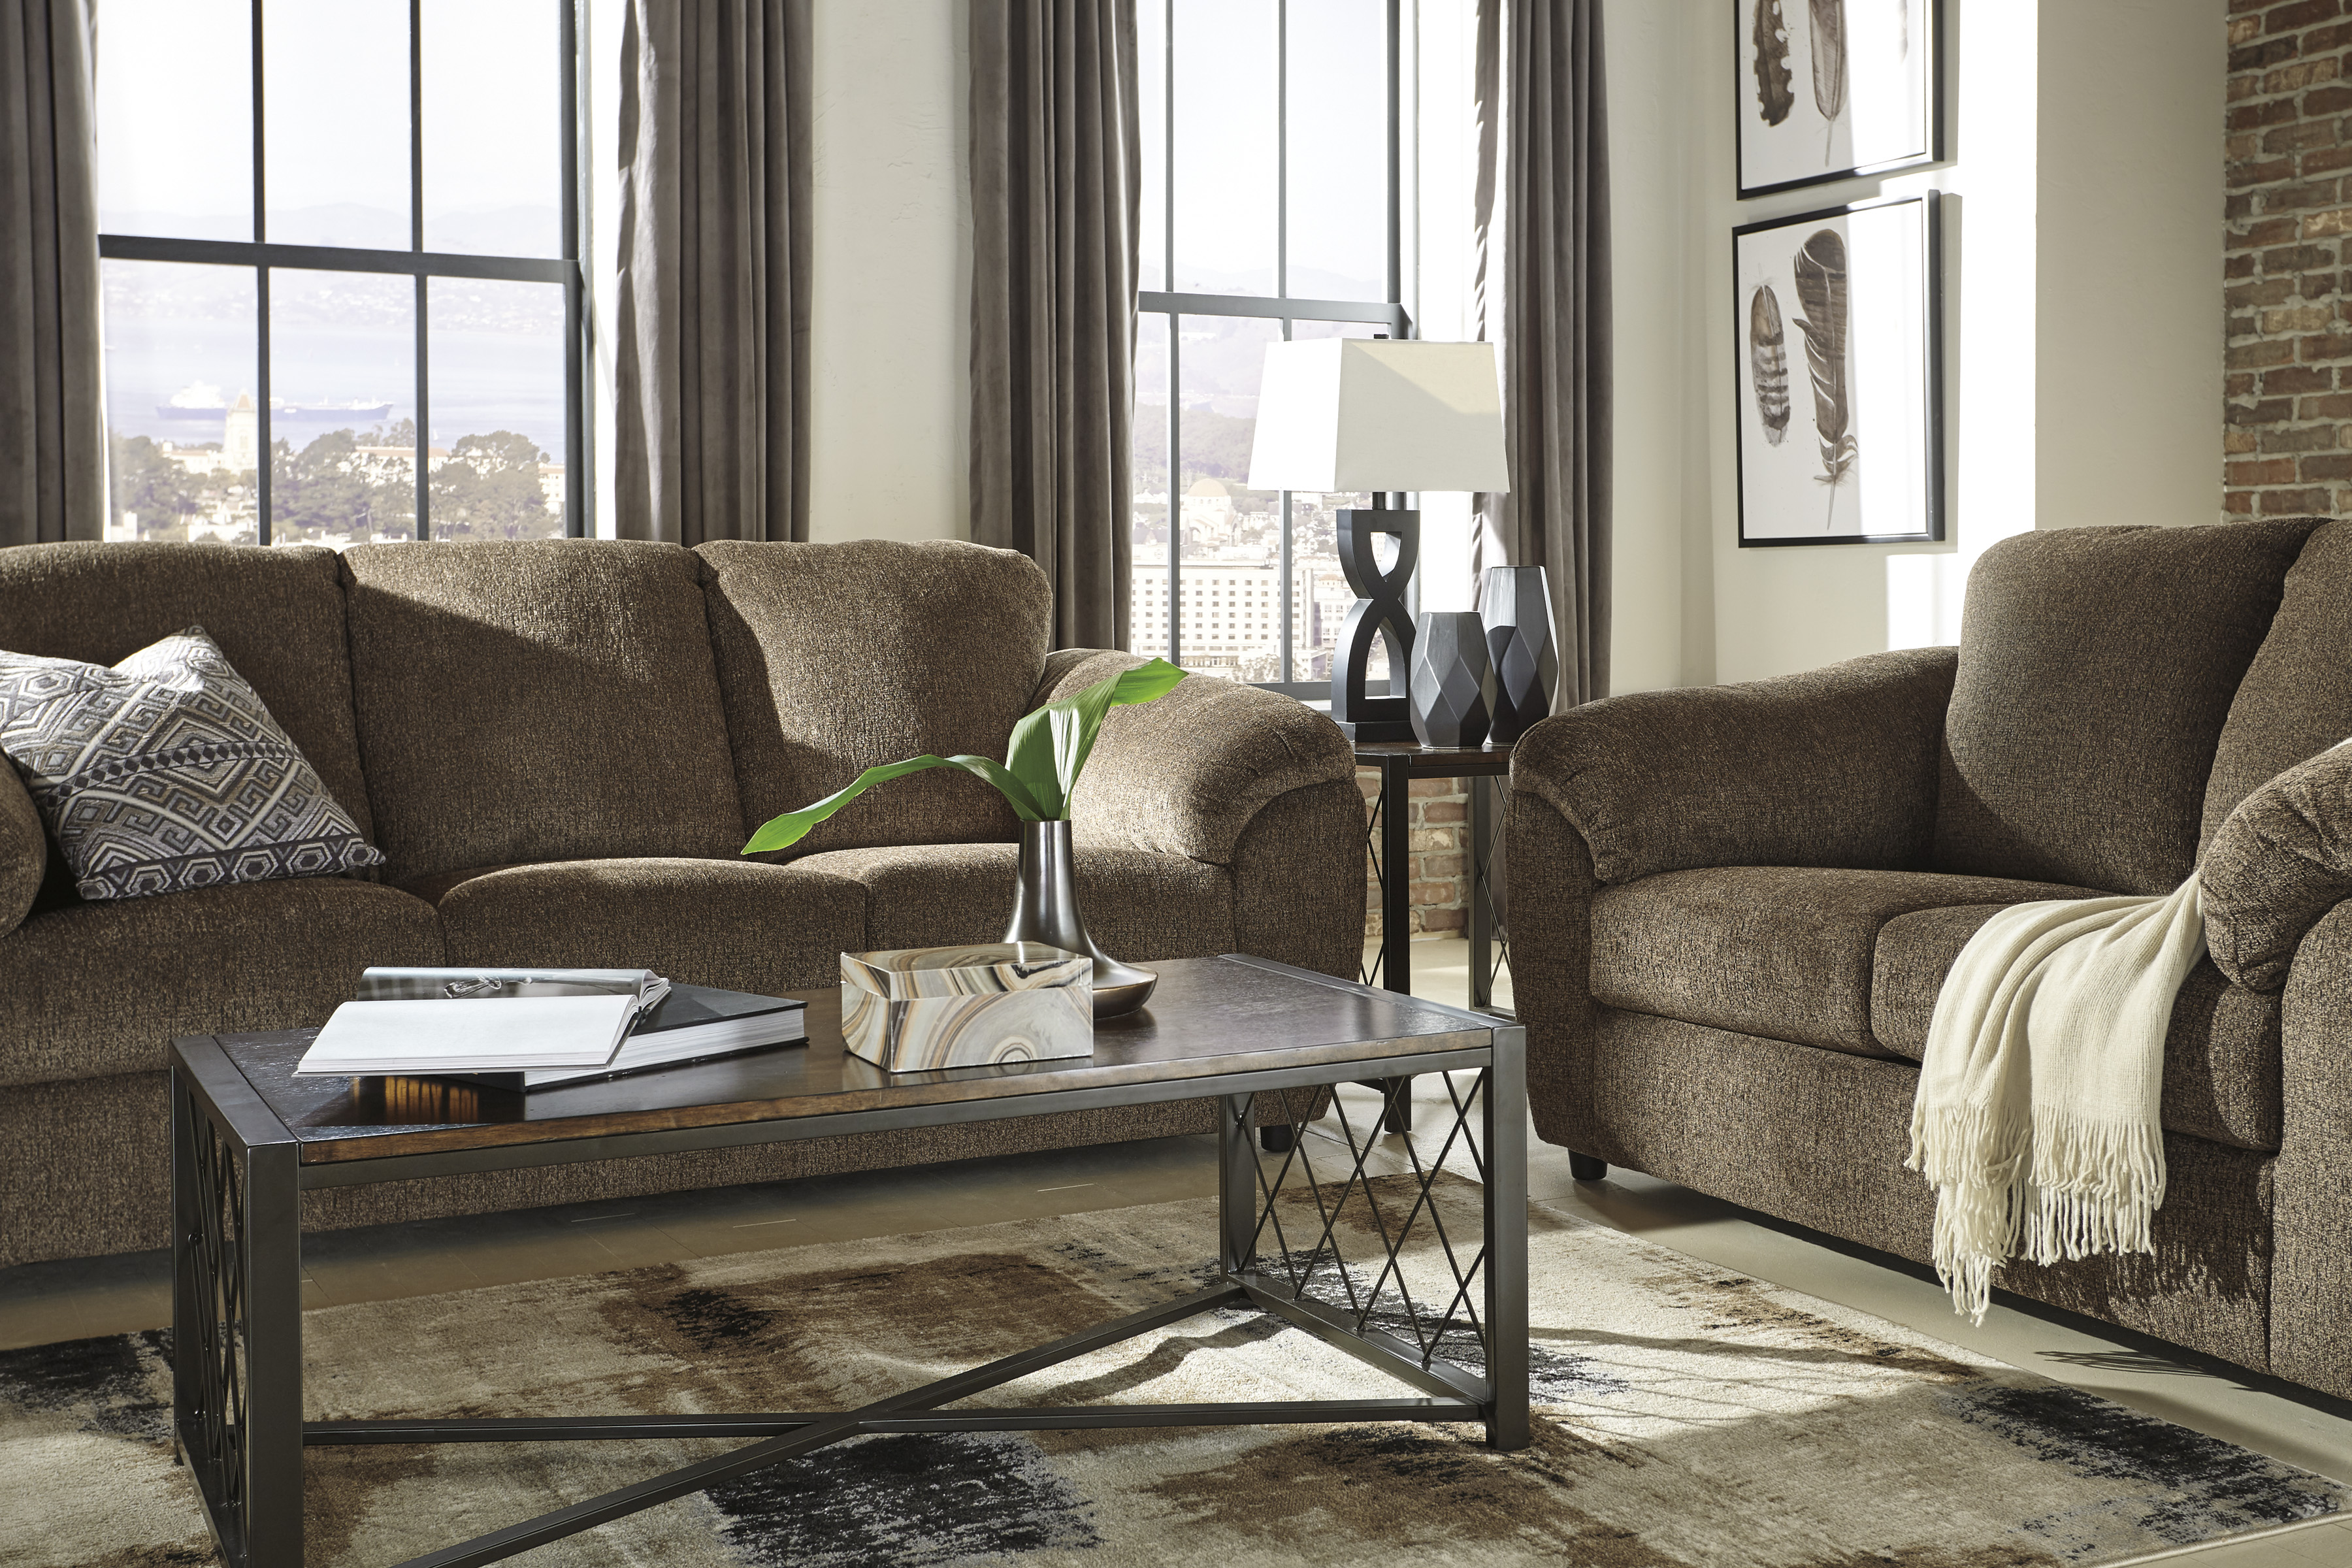 Azaline Umber Full Sofa Sleeper Easy To Lift Mechanism Queen Mattress In Quality Memory Foam